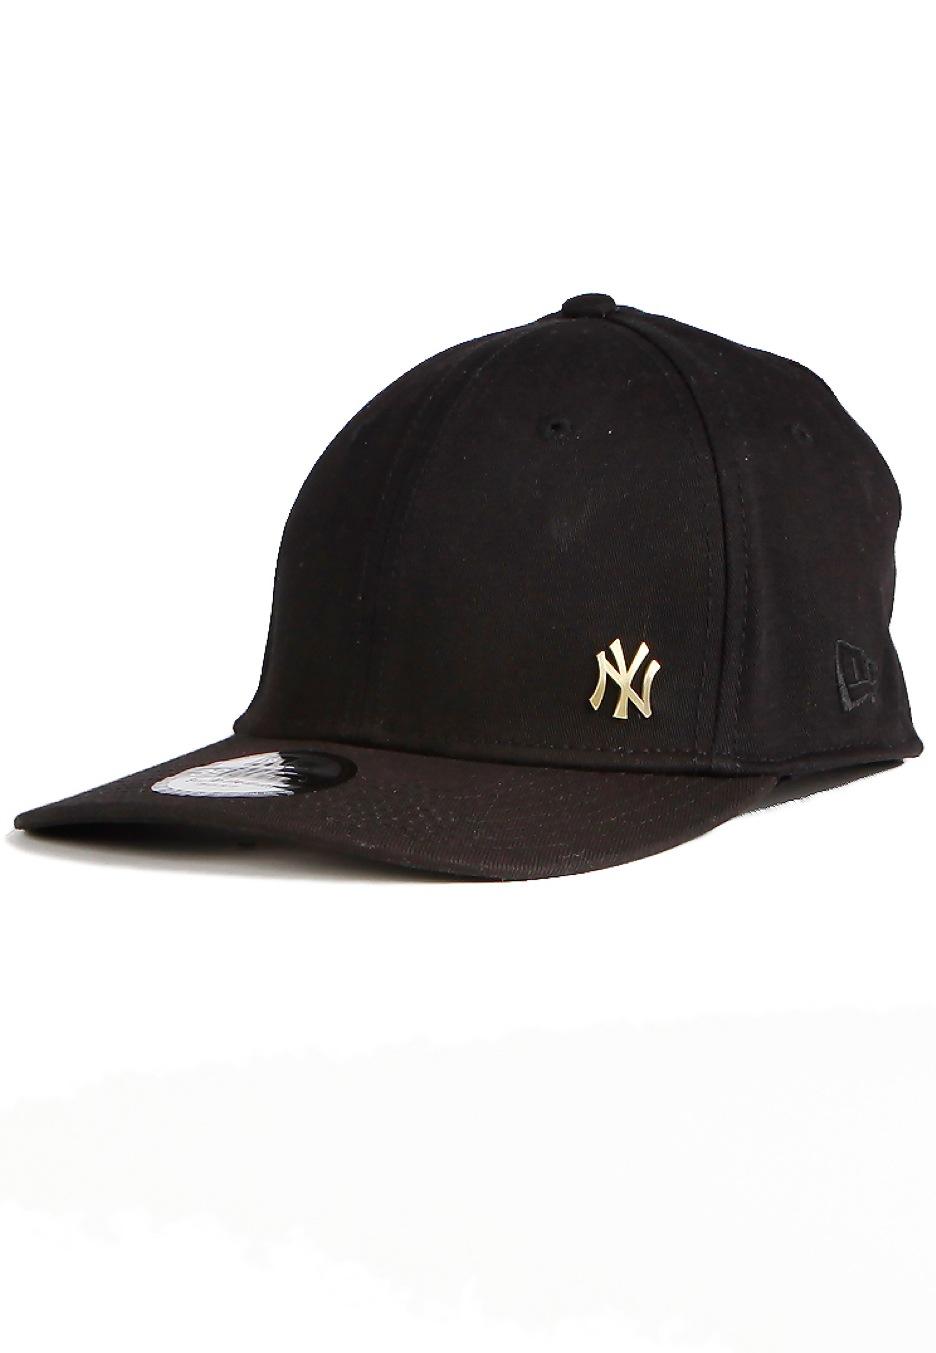 e7c976da998 New Era - Flawsheen 3930 New York Yankees Black Gold - Cap - Streetwear  Shop - Impericon.com UK